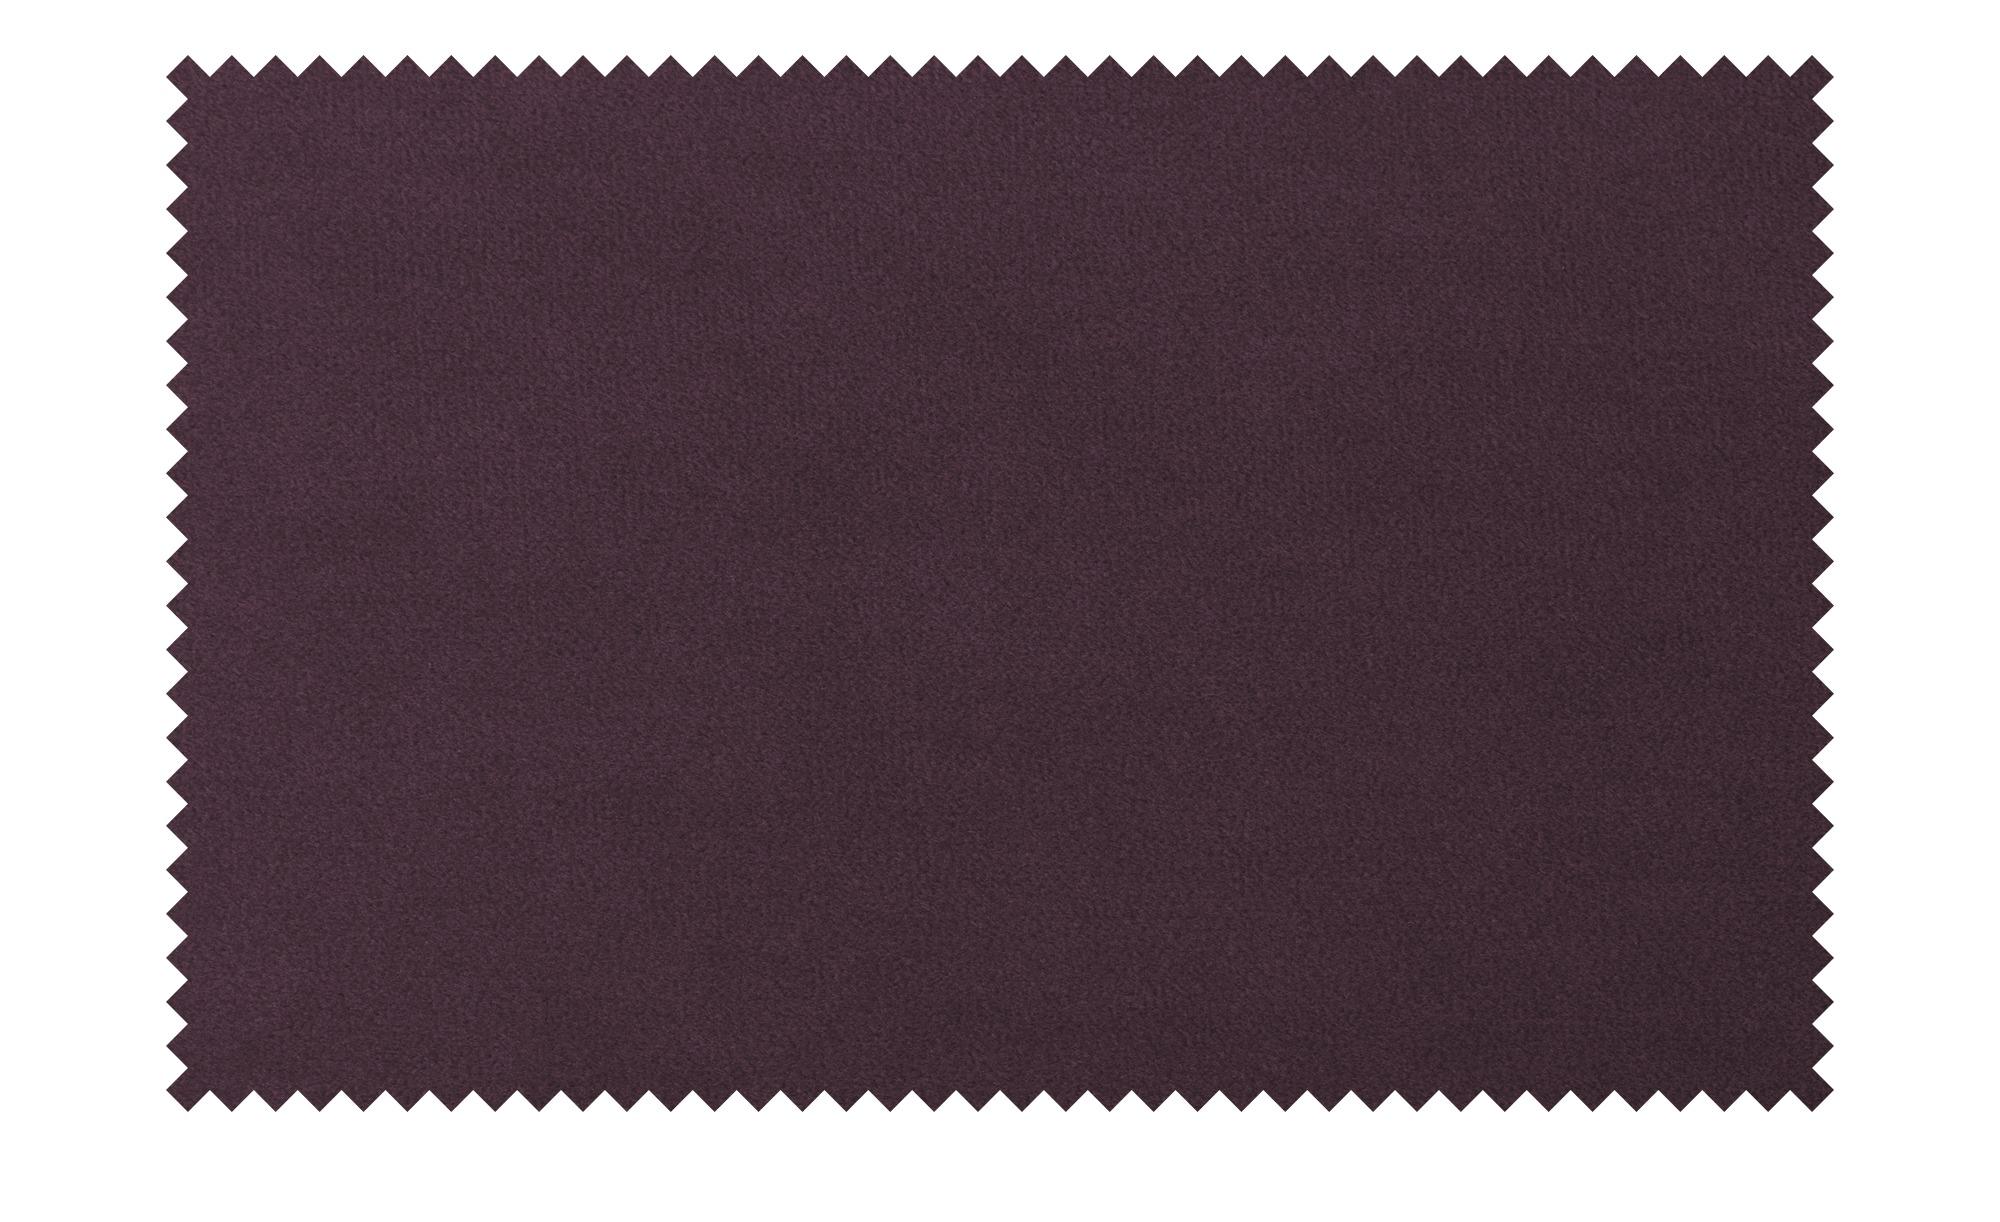 Longseat-Sessel  Caldara ¦ lila/violett ¦ Maße (cm): B: 126 H: 94 T: 160 Polstermöbel > Sessel > Polstersessel - Höffner